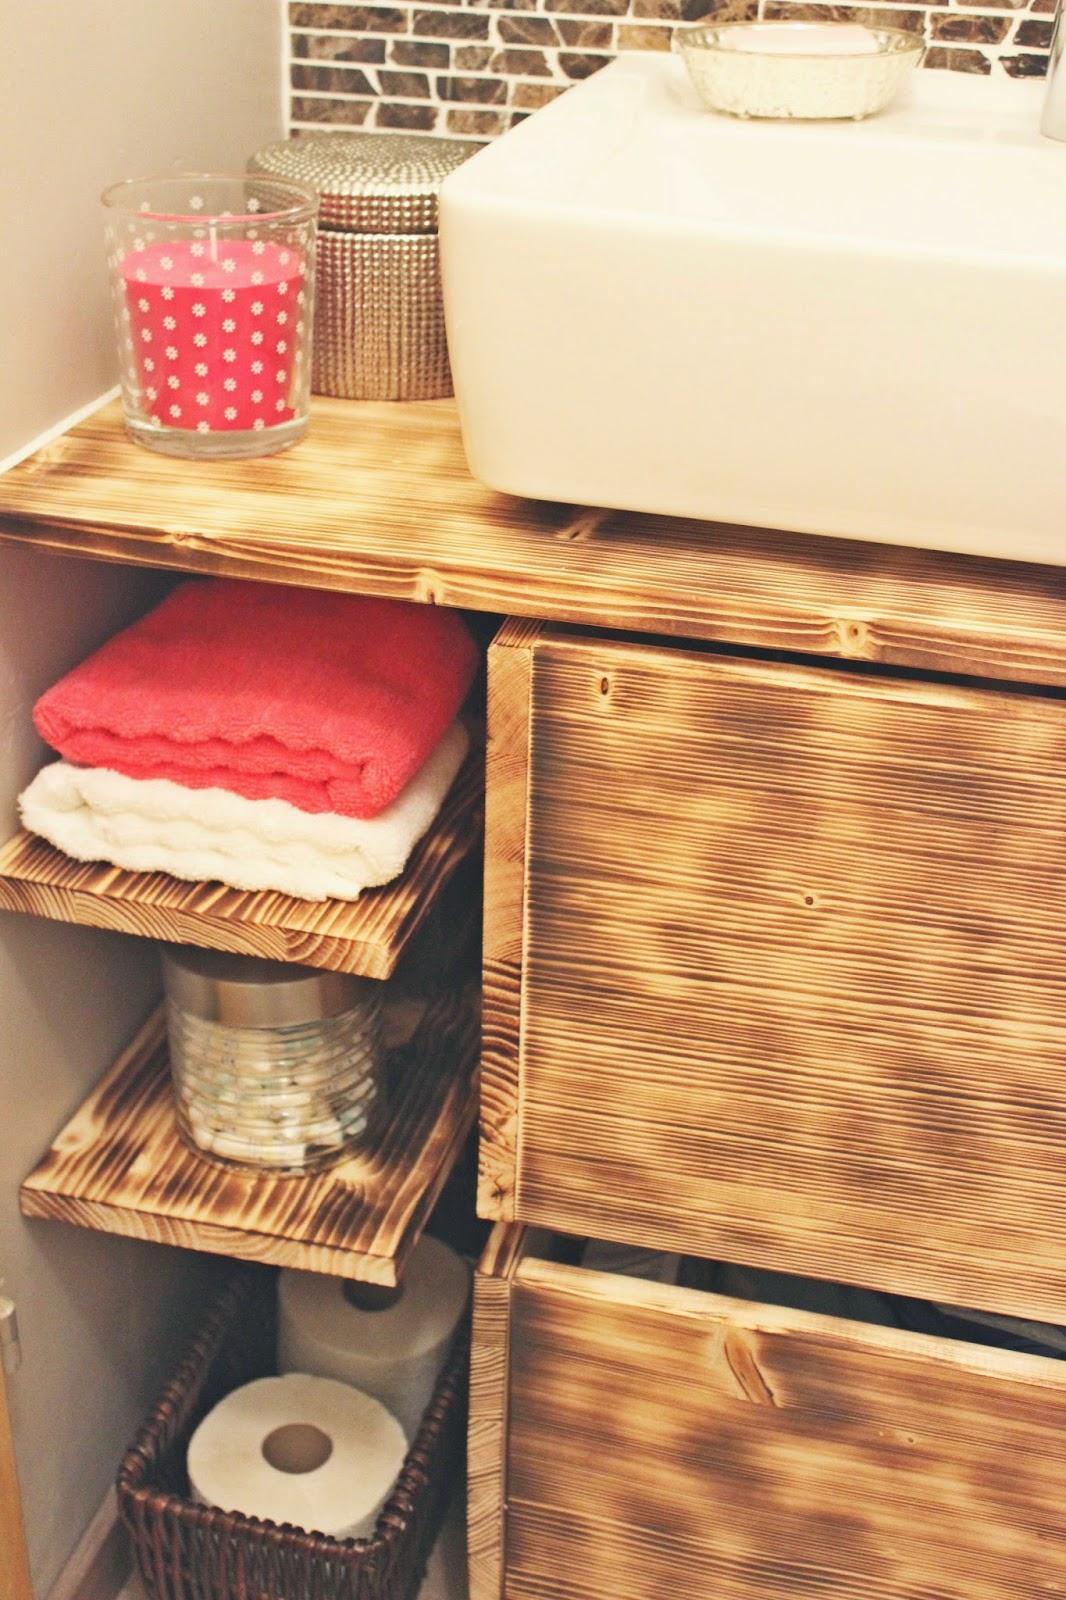 s 39 bastelkistle roomtour wc vorher nachher. Black Bedroom Furniture Sets. Home Design Ideas